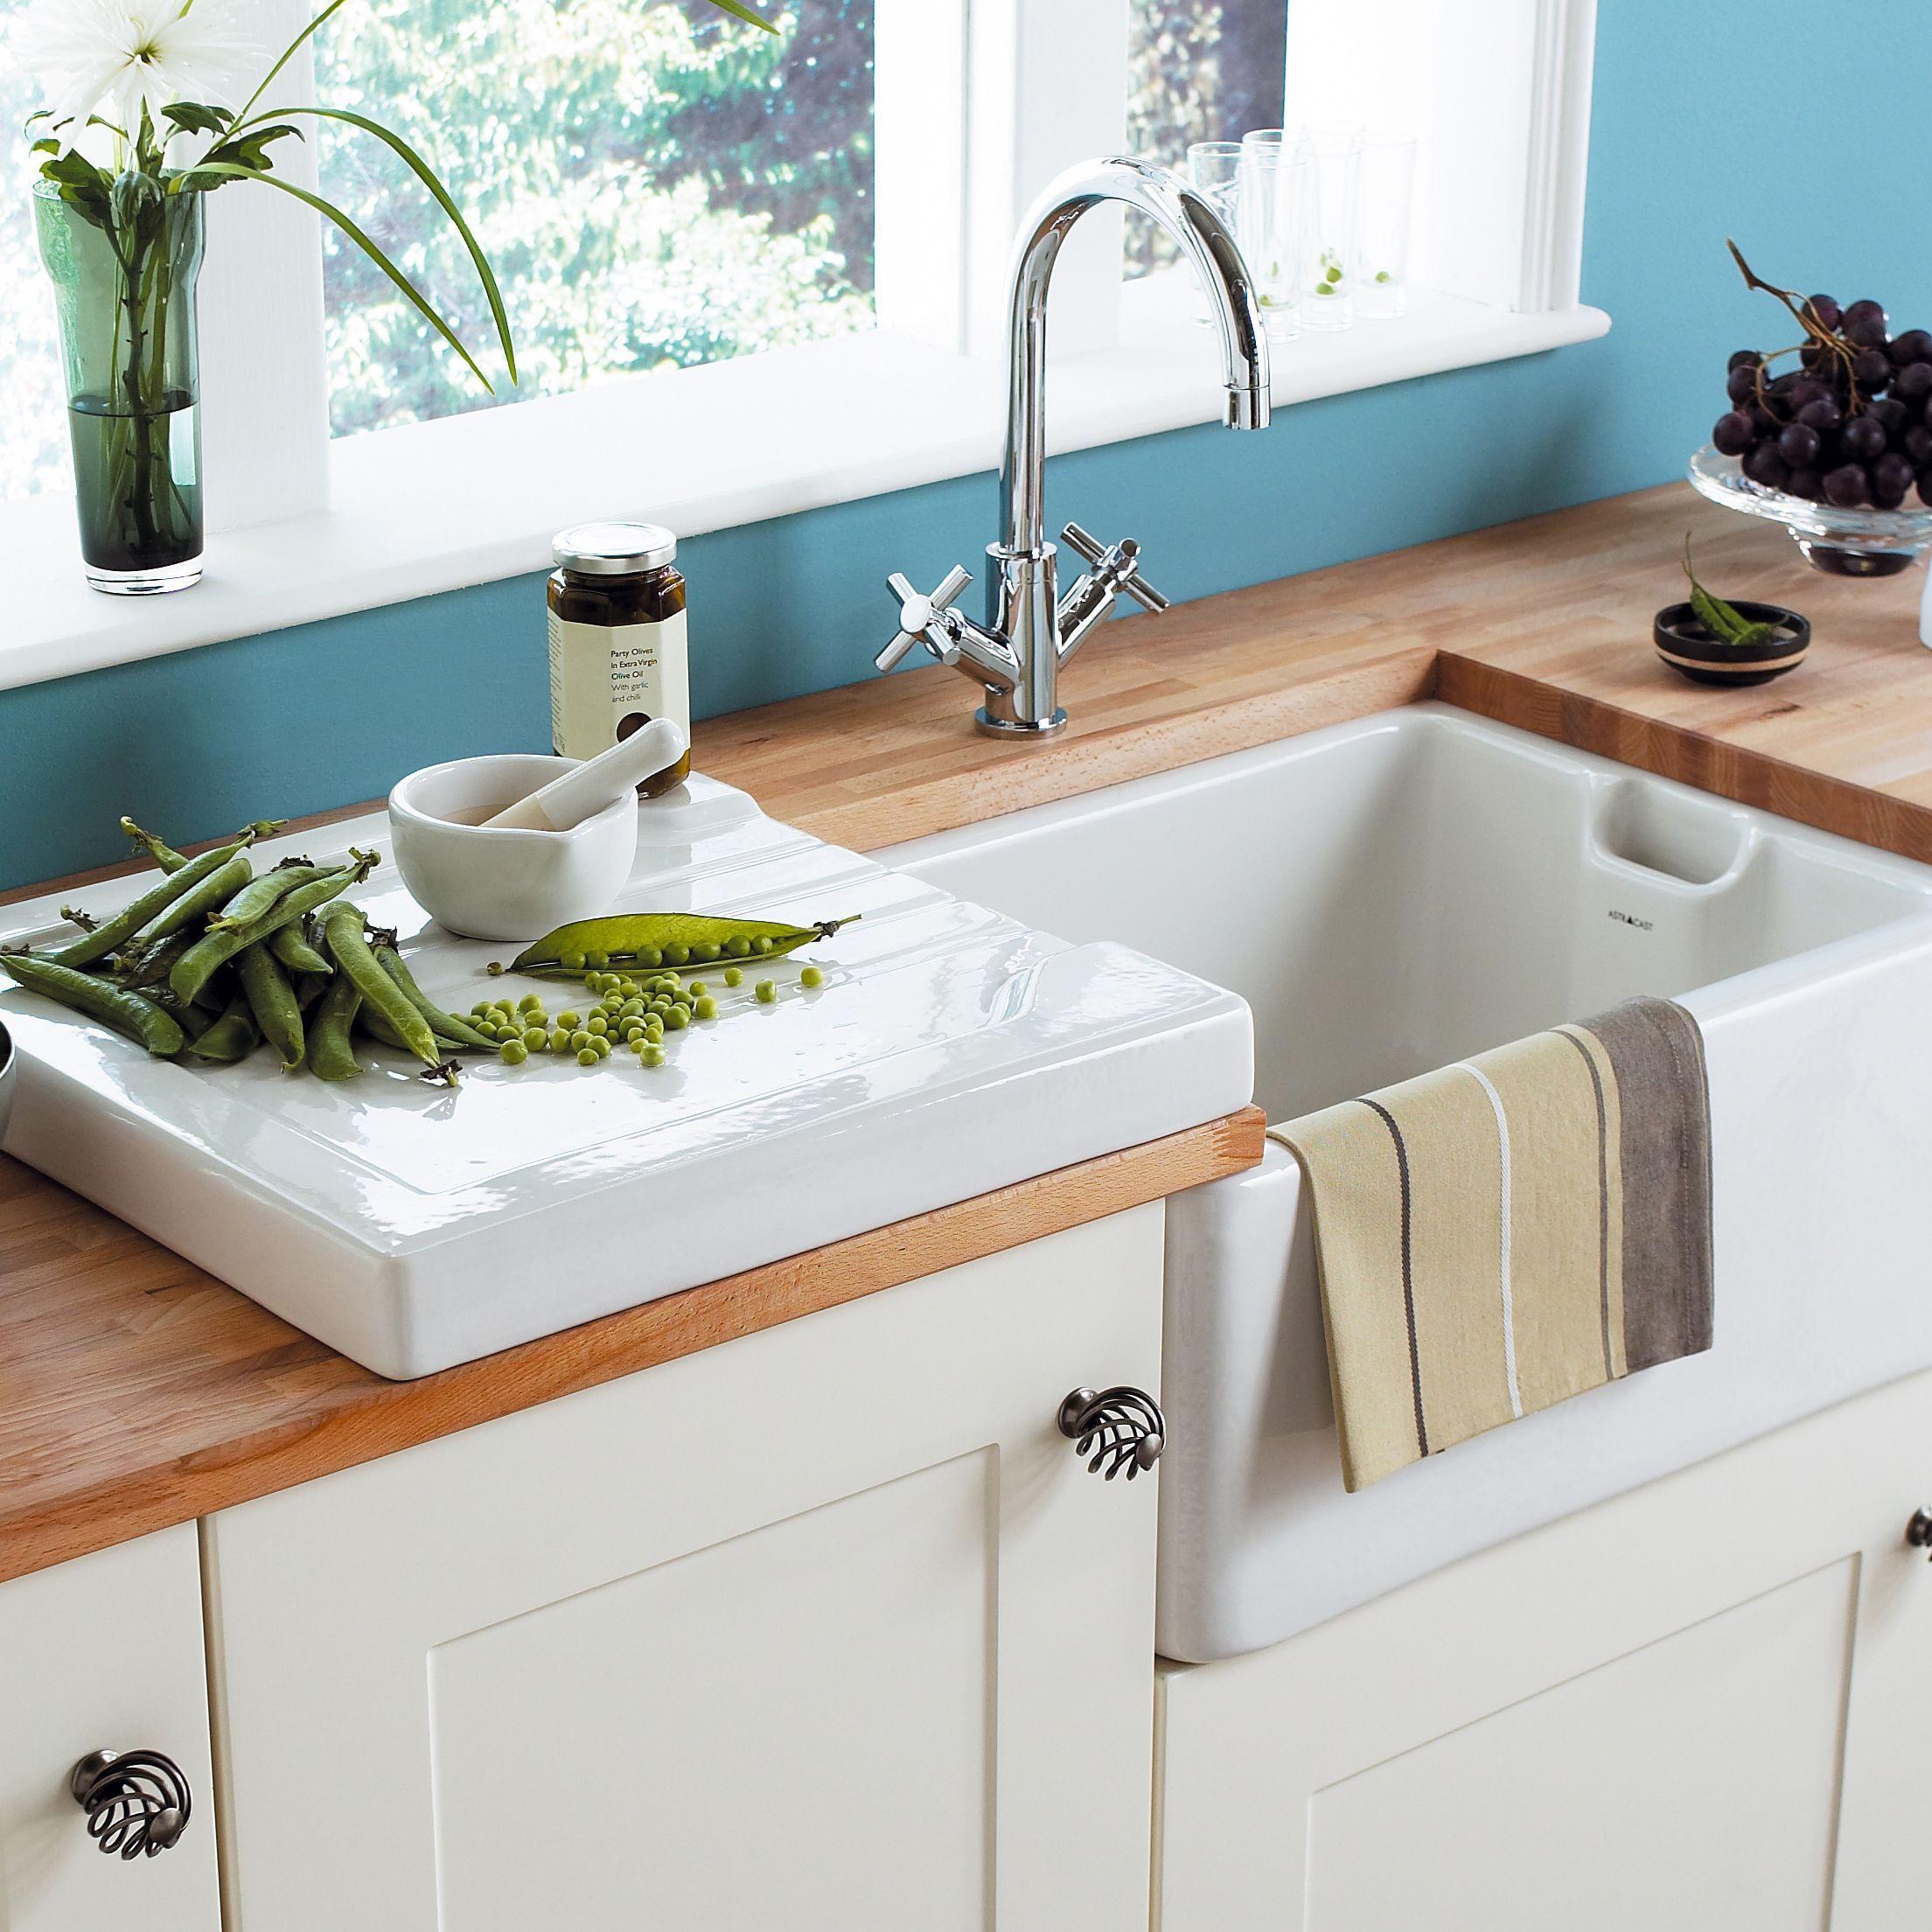 Cooke Lewis Chadwick White Ceramic 1 Bowl Sink In 2020 Belfast Sink Butler Sink White Ceramics